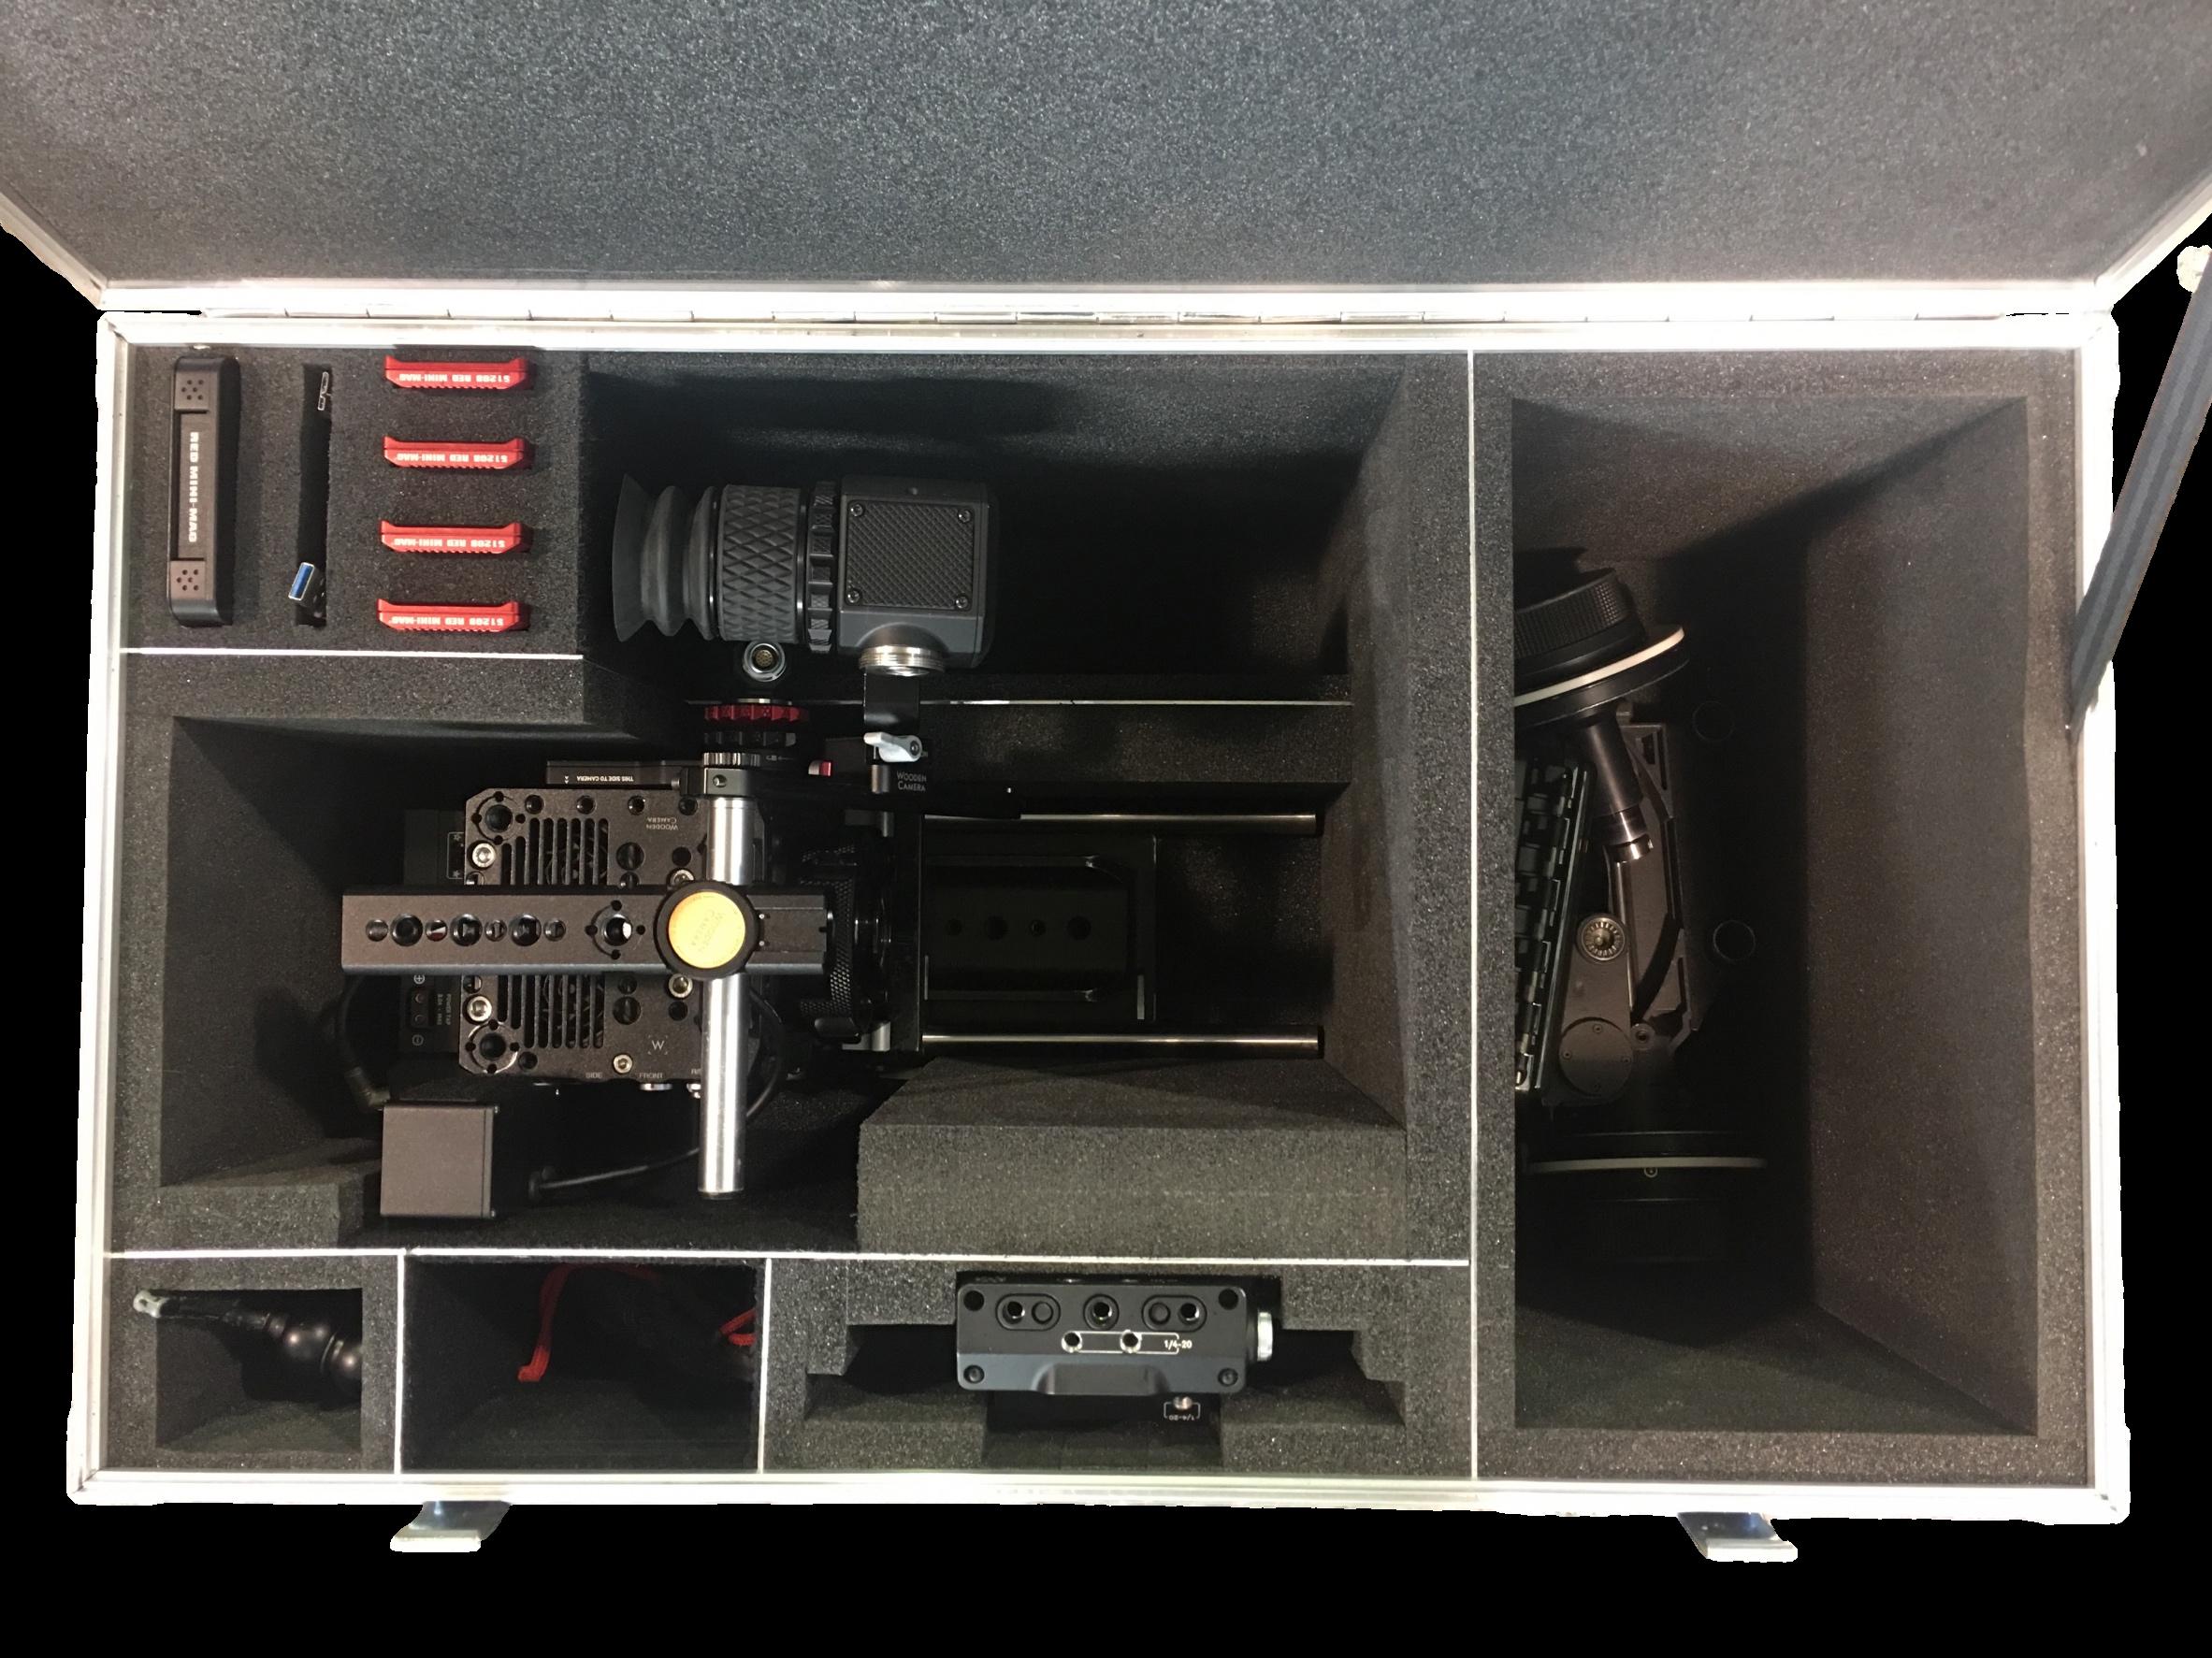 Plastazote Camera Case Fit-Out